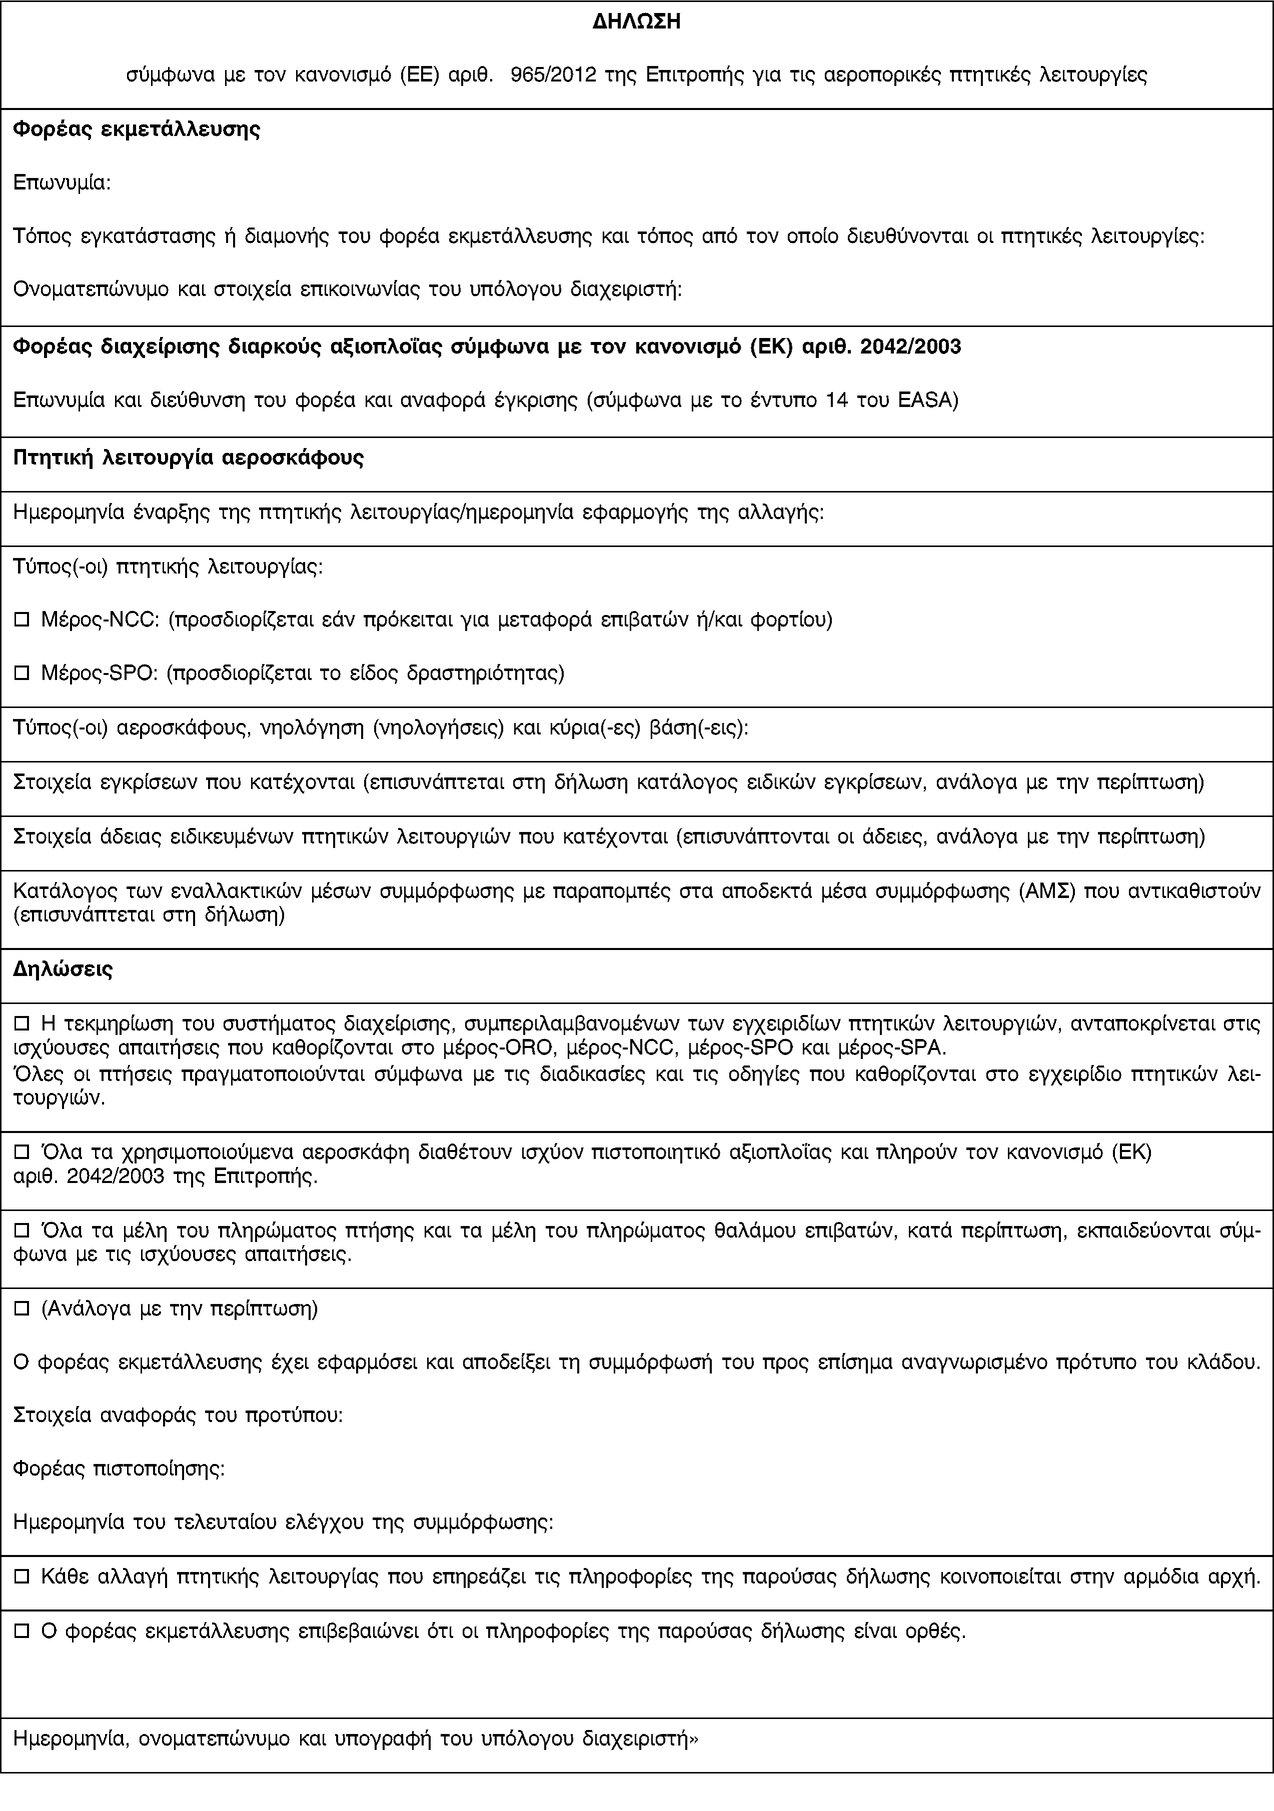 Preferenza EUR-Lex - 32014R0379 - EN - EUR-Lex FE58